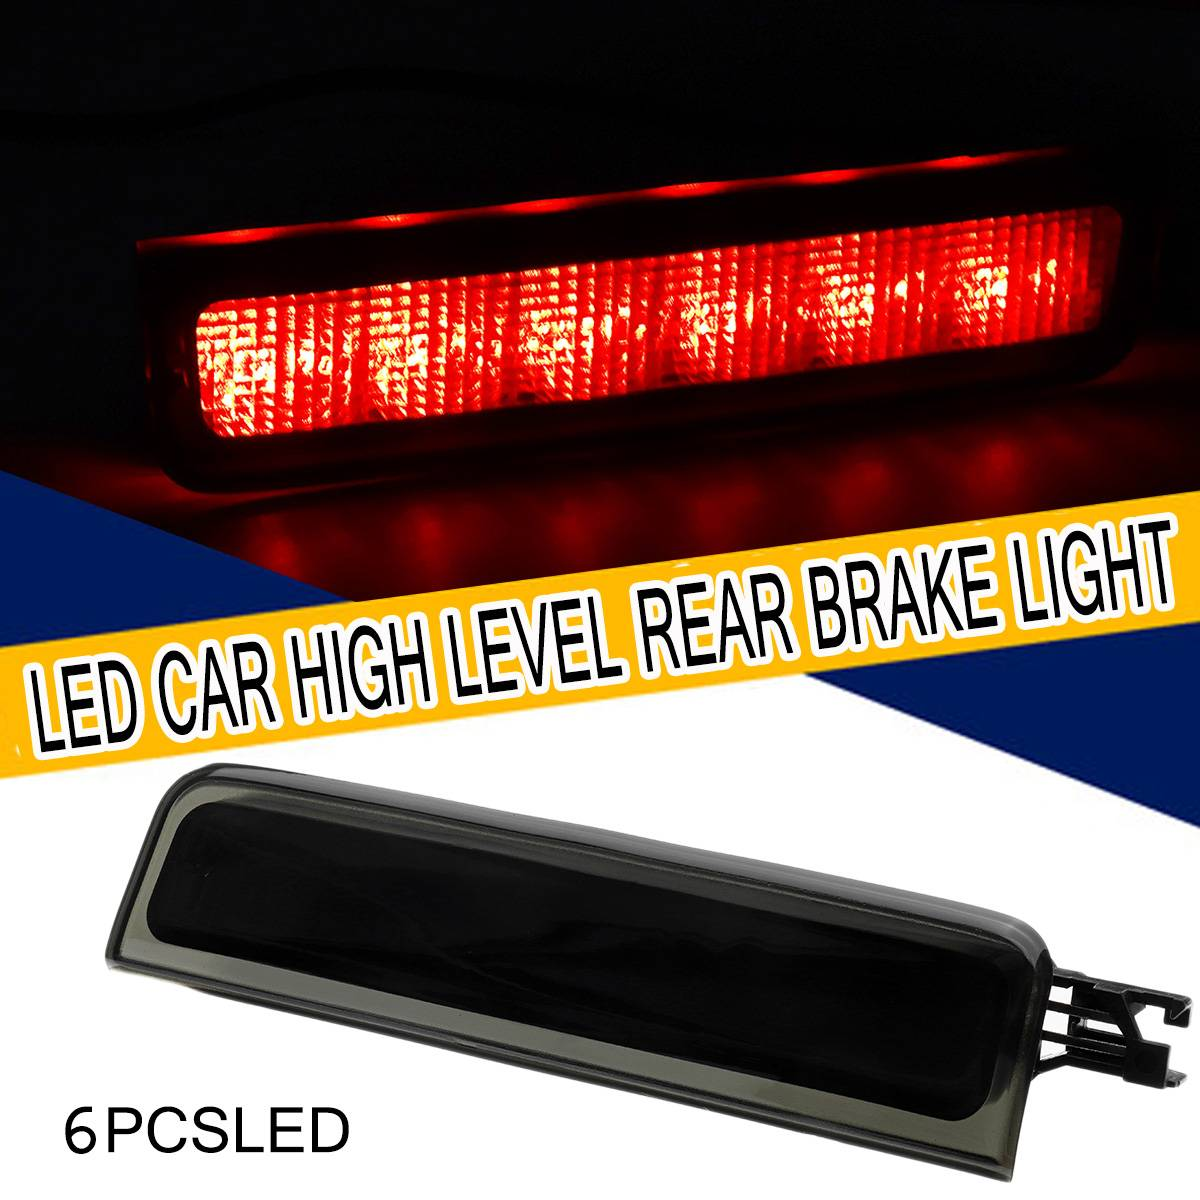 Led Car Third Brake Light High Level Rear Brake Light Stop Lamp Auto High Mount Brake Light for VW Caddy Touran 2004-2015